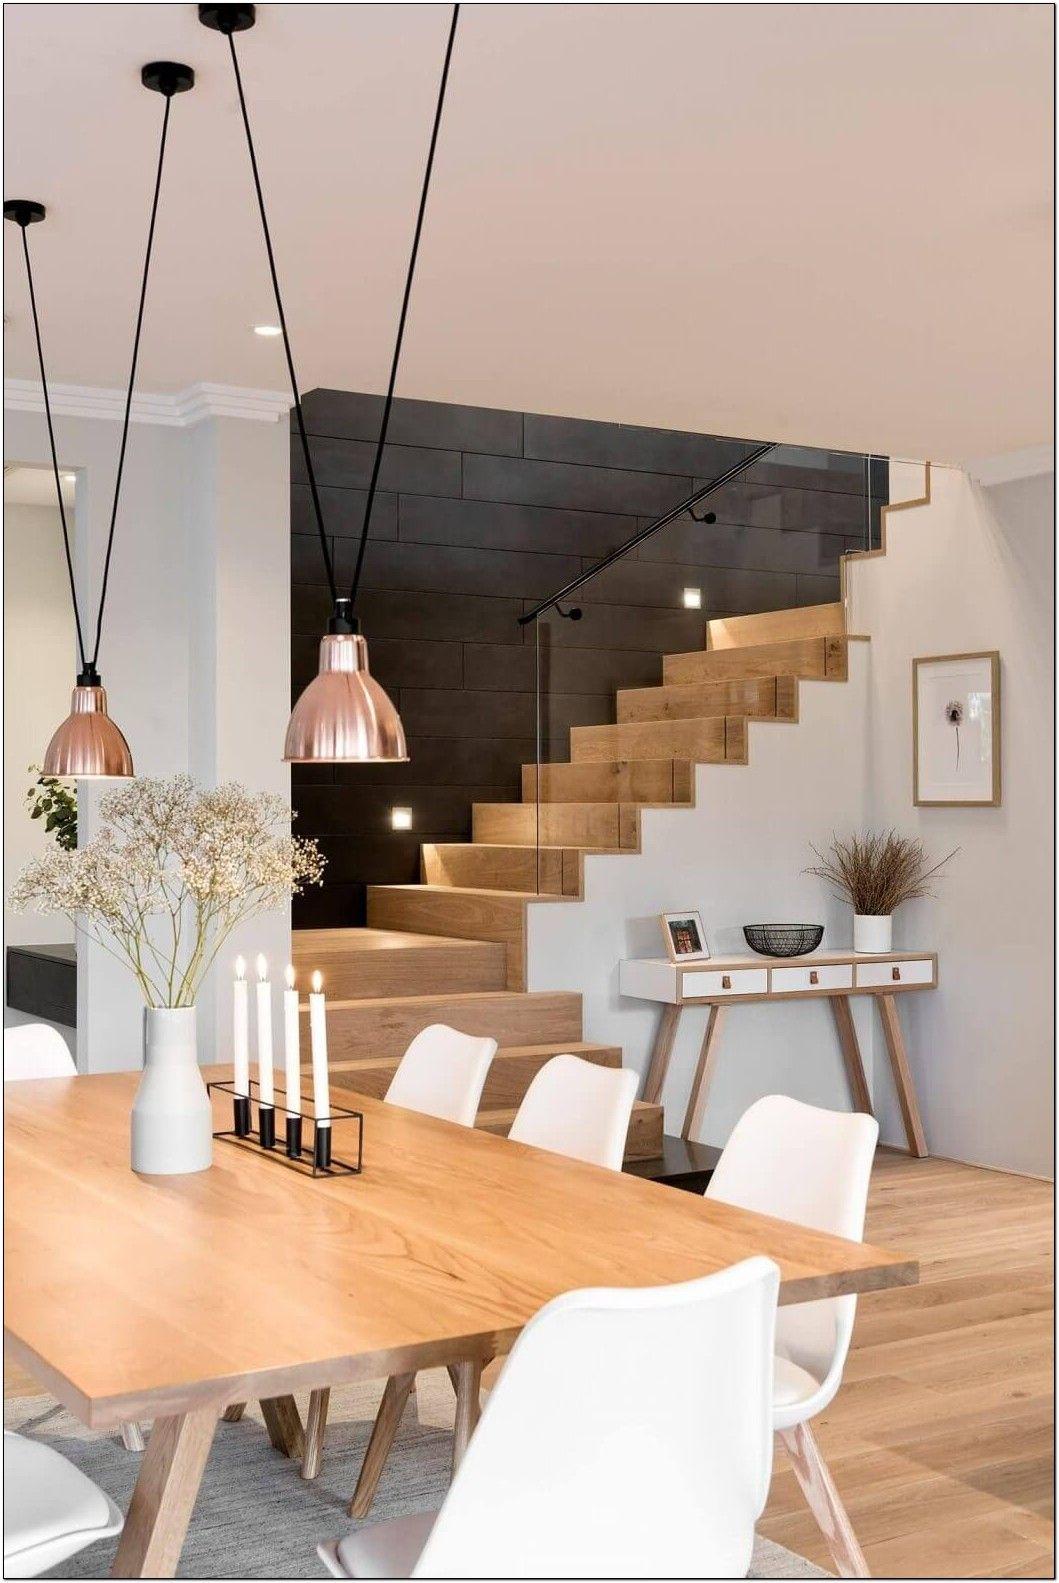 30 The Basic Principles Of Best Modern House Design Interior Ideas European Home Decor Modern Interior Design Modern House Design